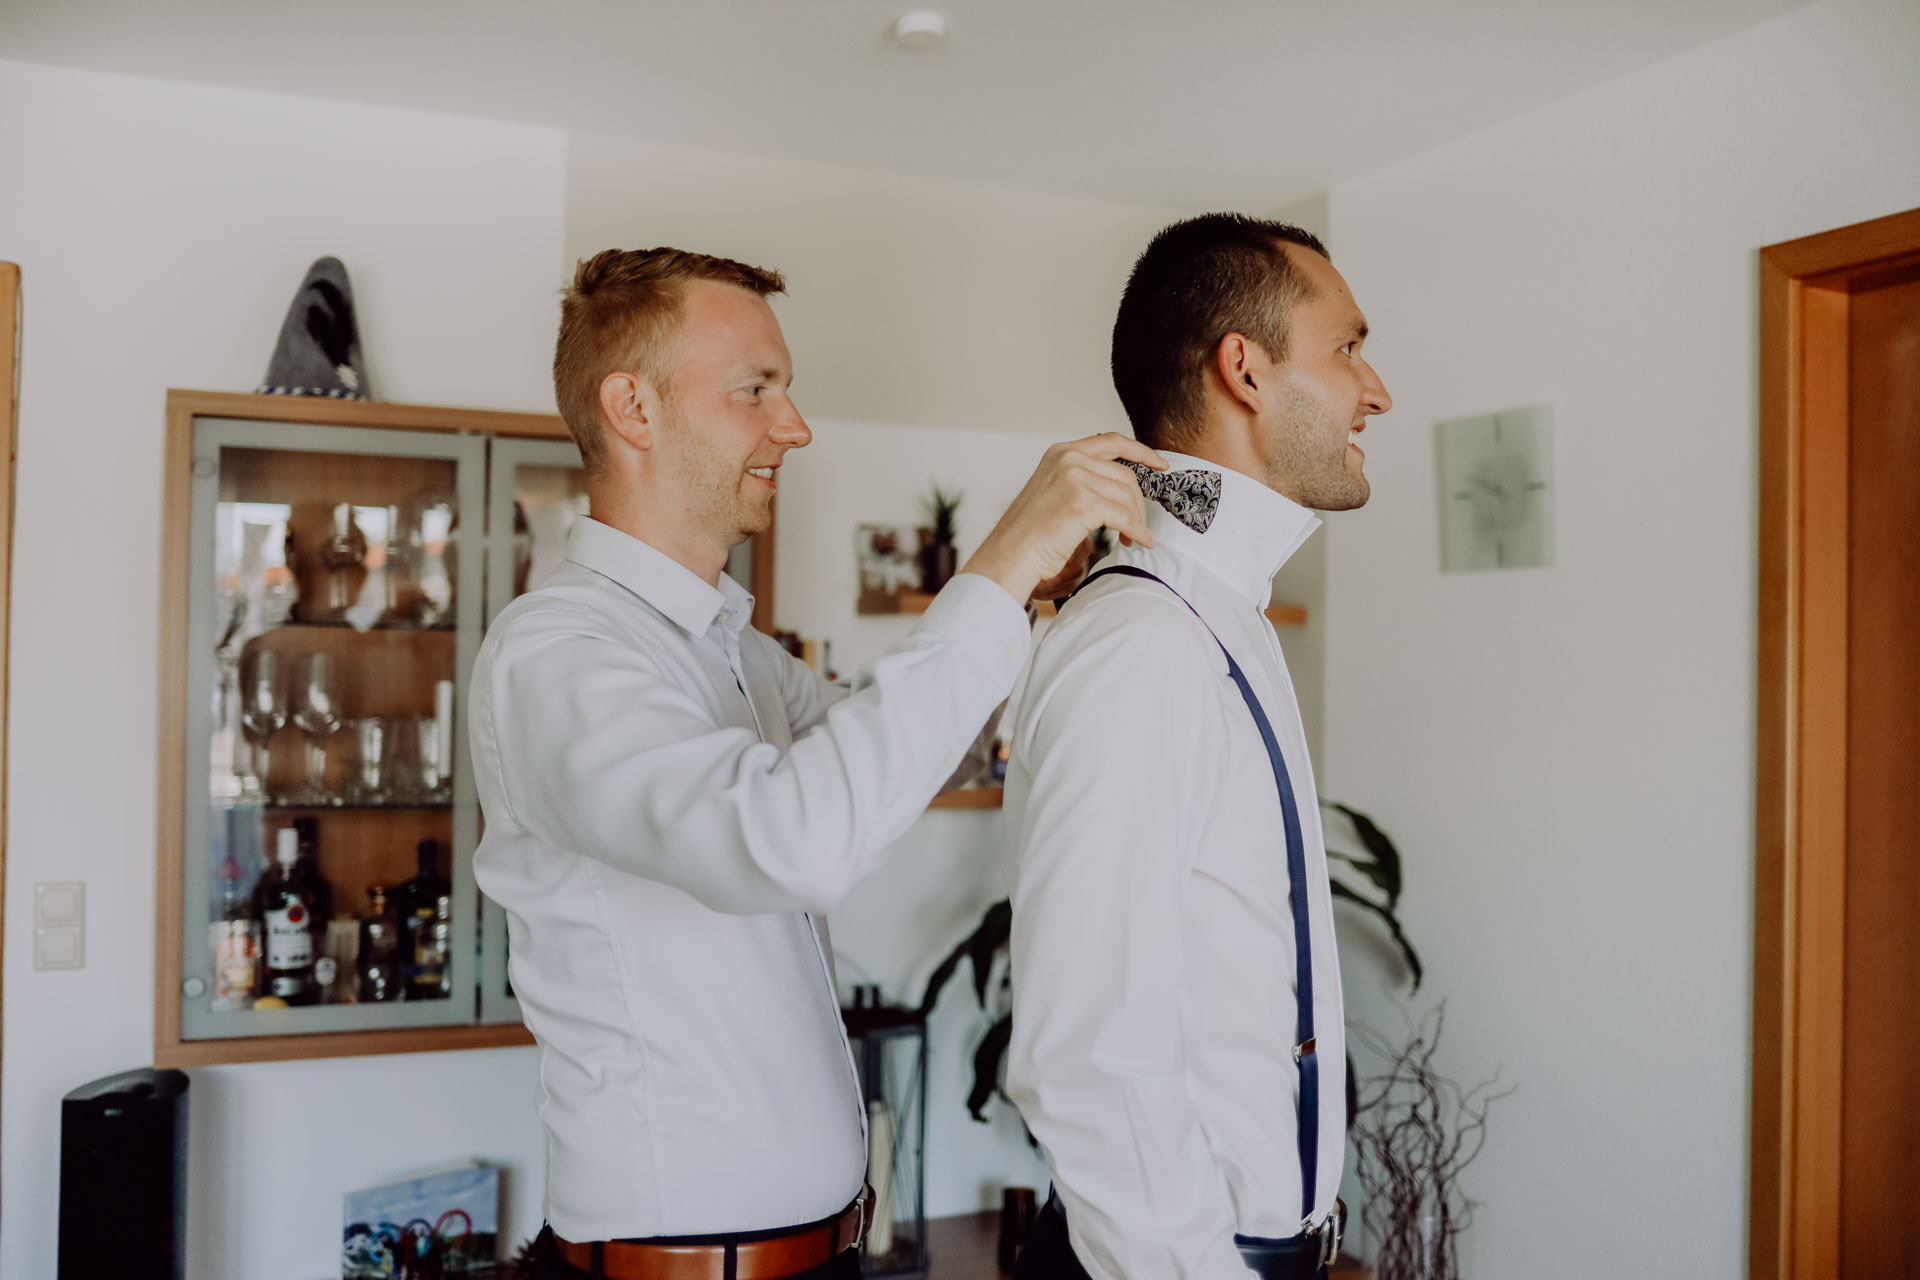 Mann legt Bräutigam Fliege um den Hals